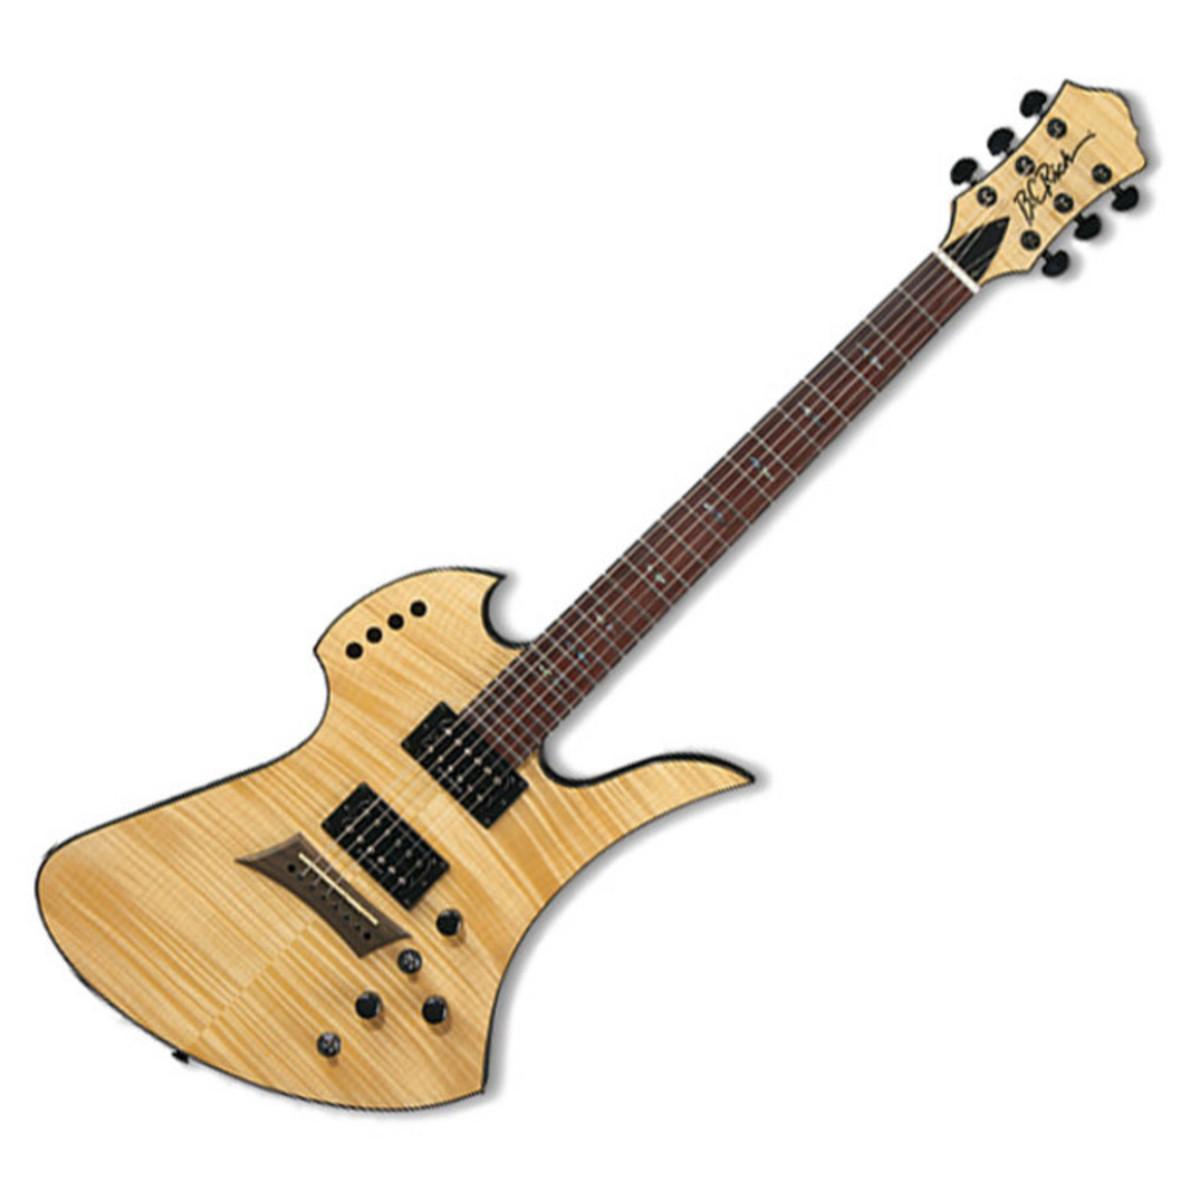 puis bc rich mockingbird polarit guitare deluxe. Black Bedroom Furniture Sets. Home Design Ideas